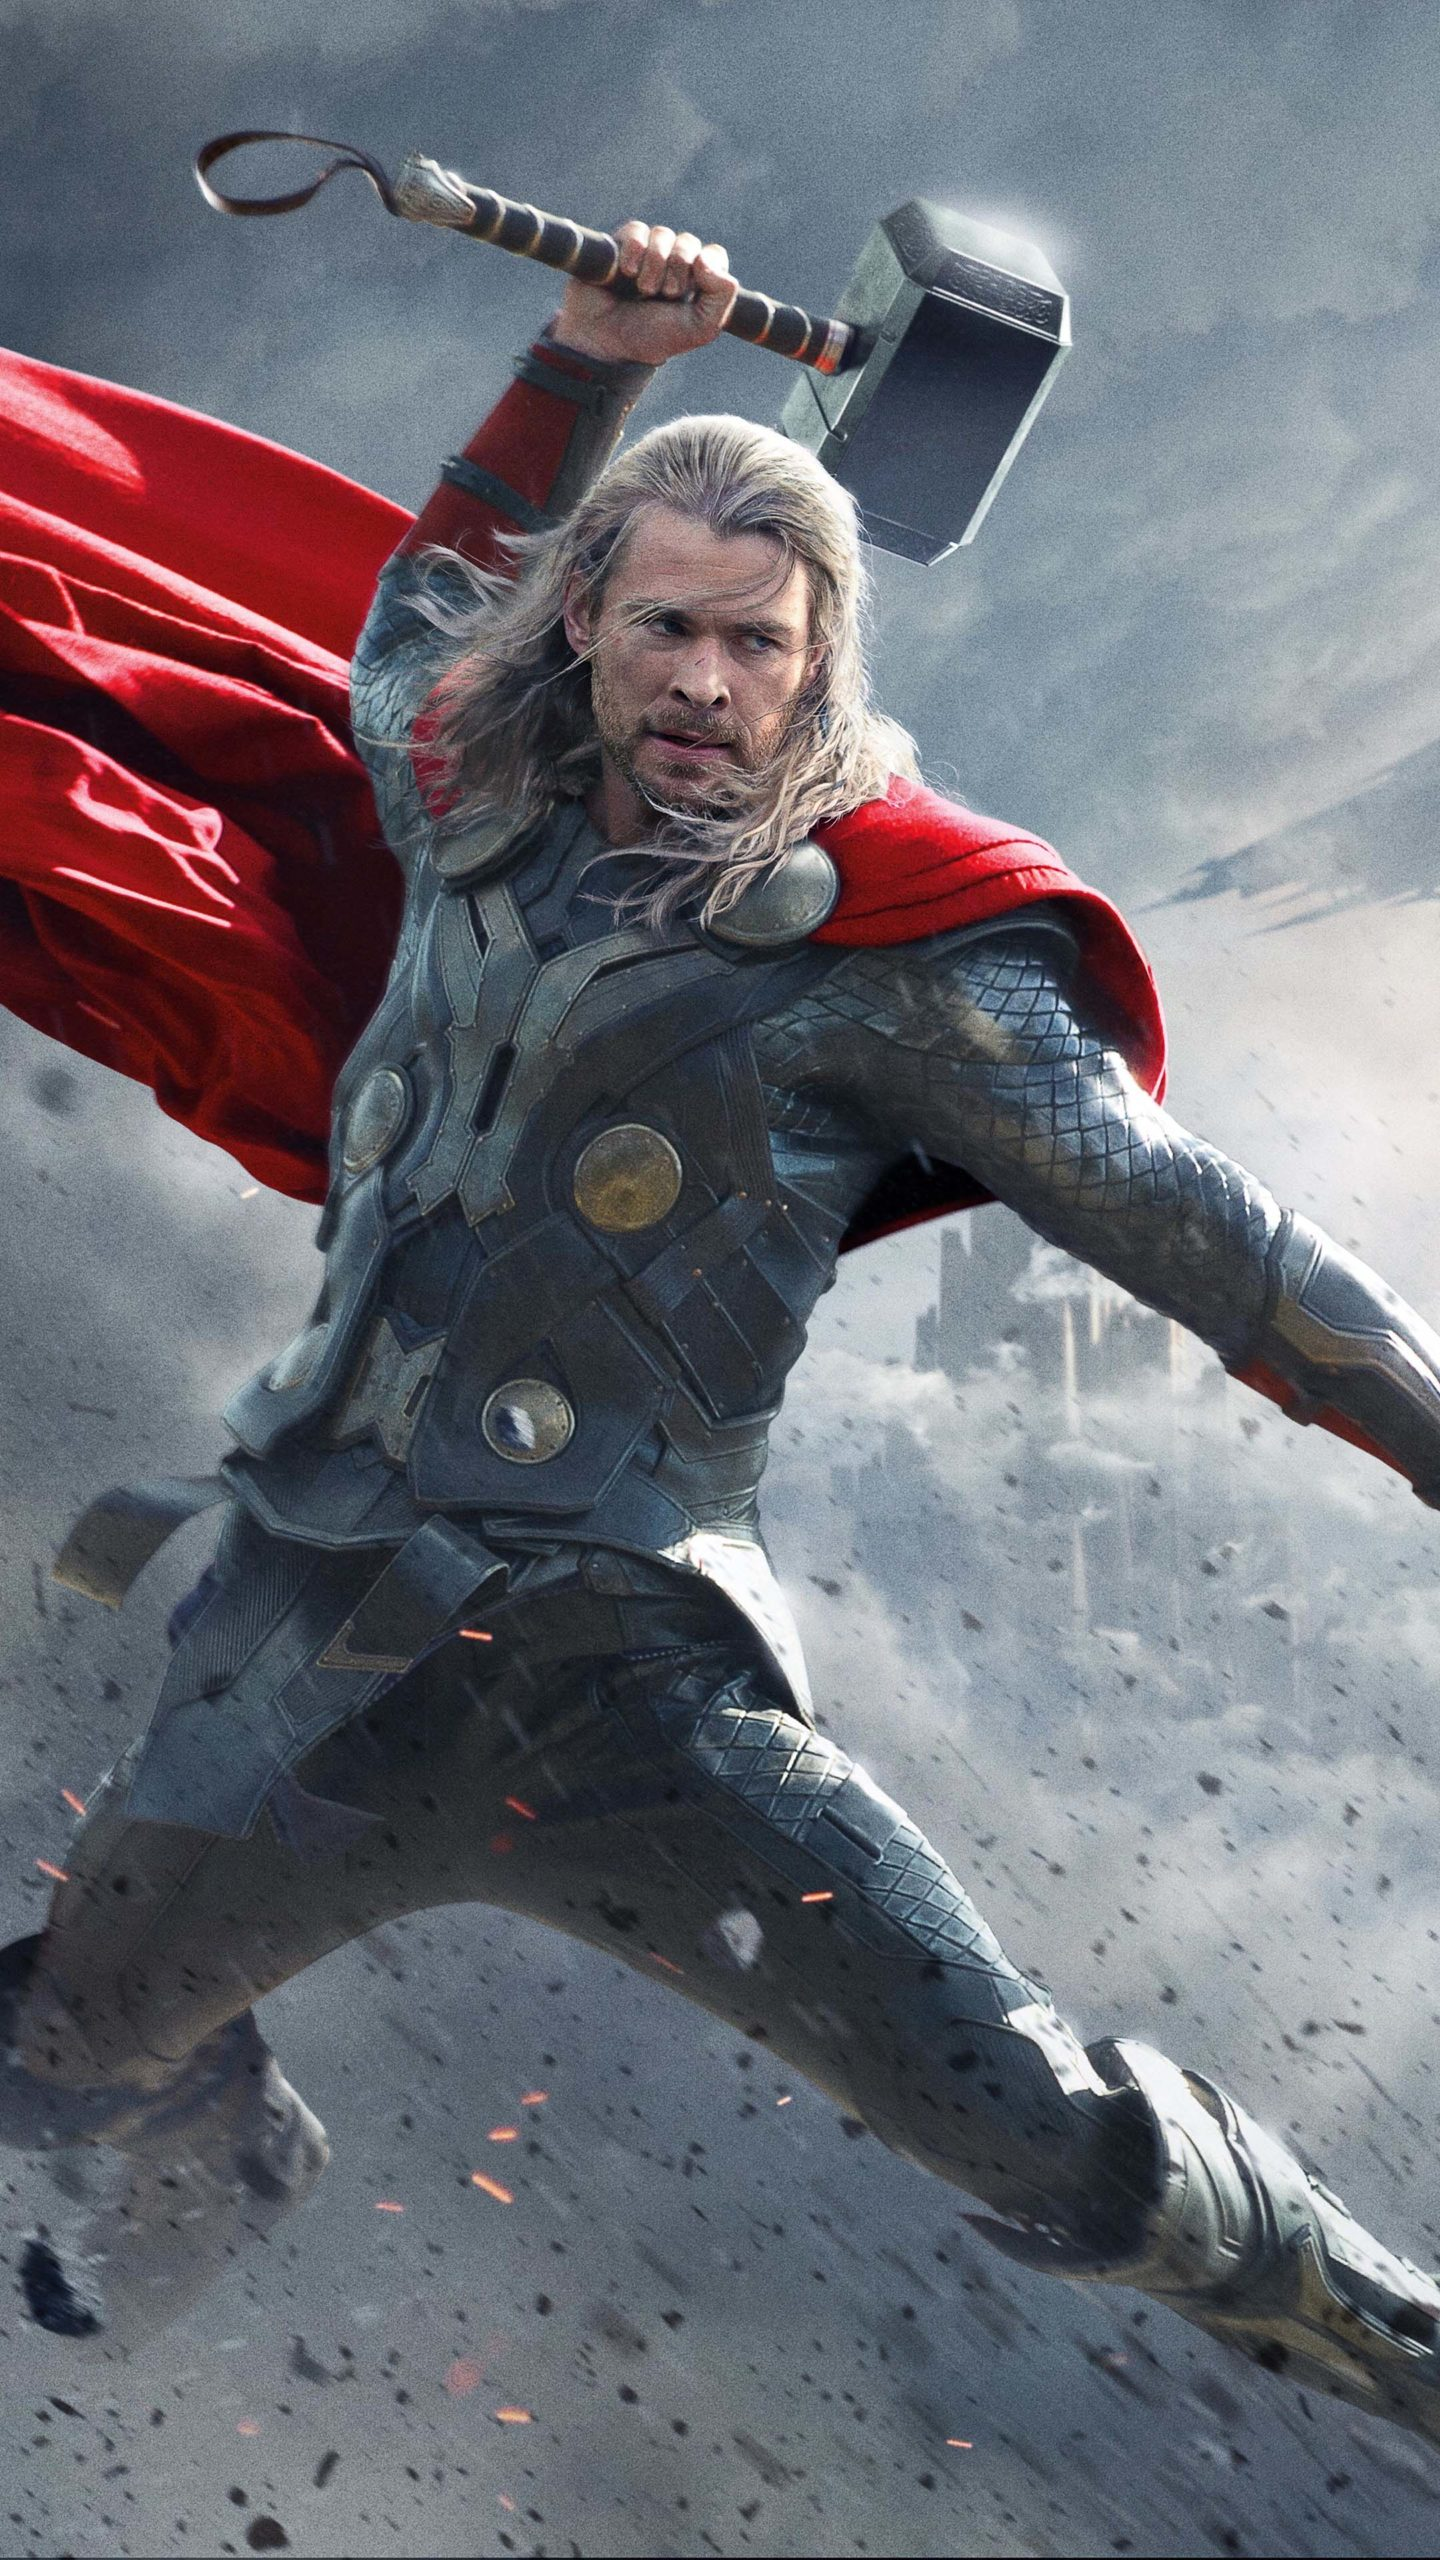 Thor Superhero Chris Hemsworth 4K Ultra HD Mobile Wallpaper